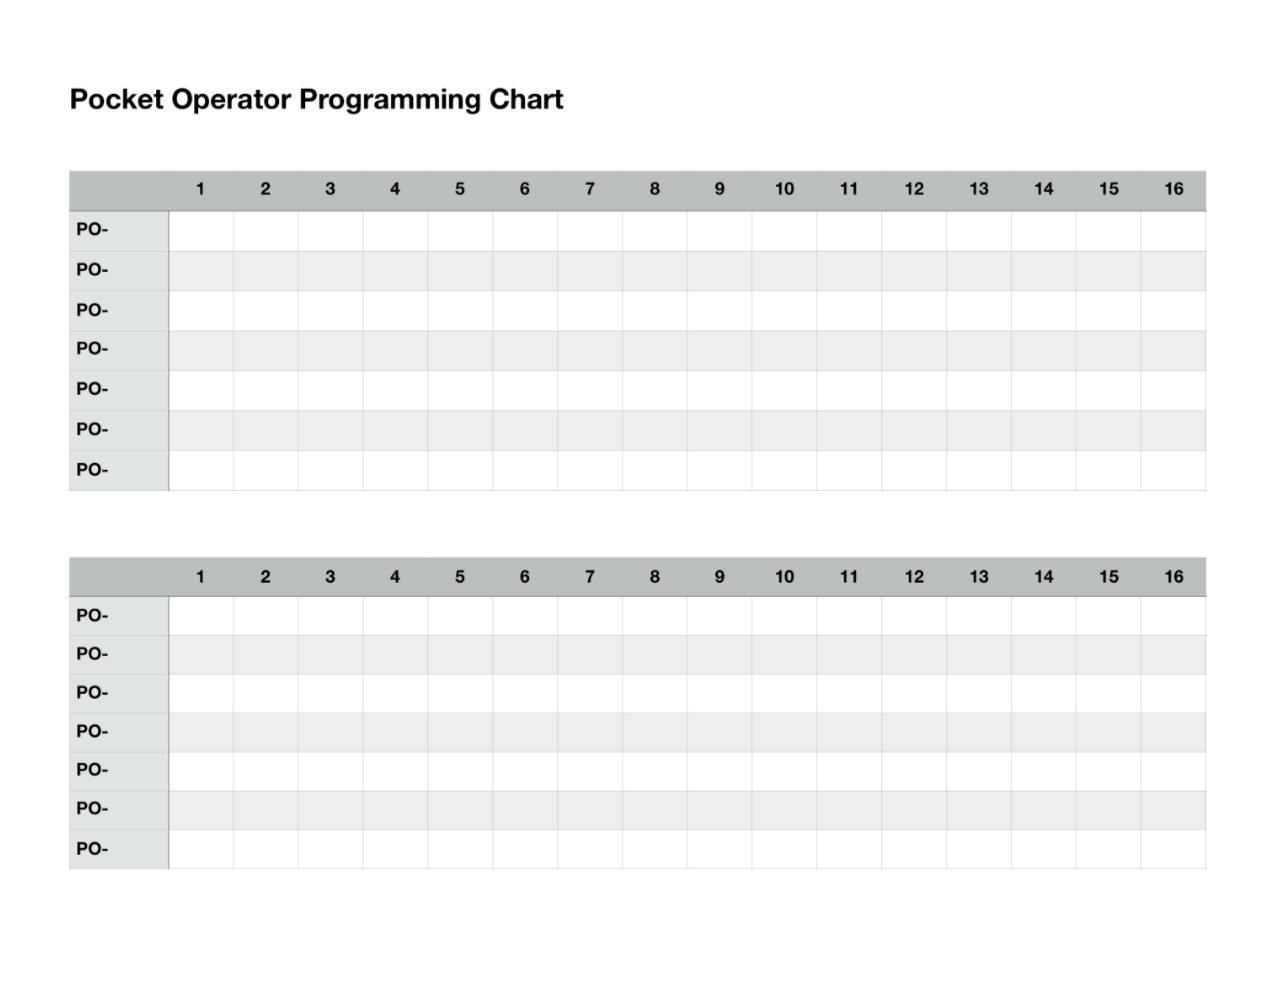 Pocket Operator Programming Chart